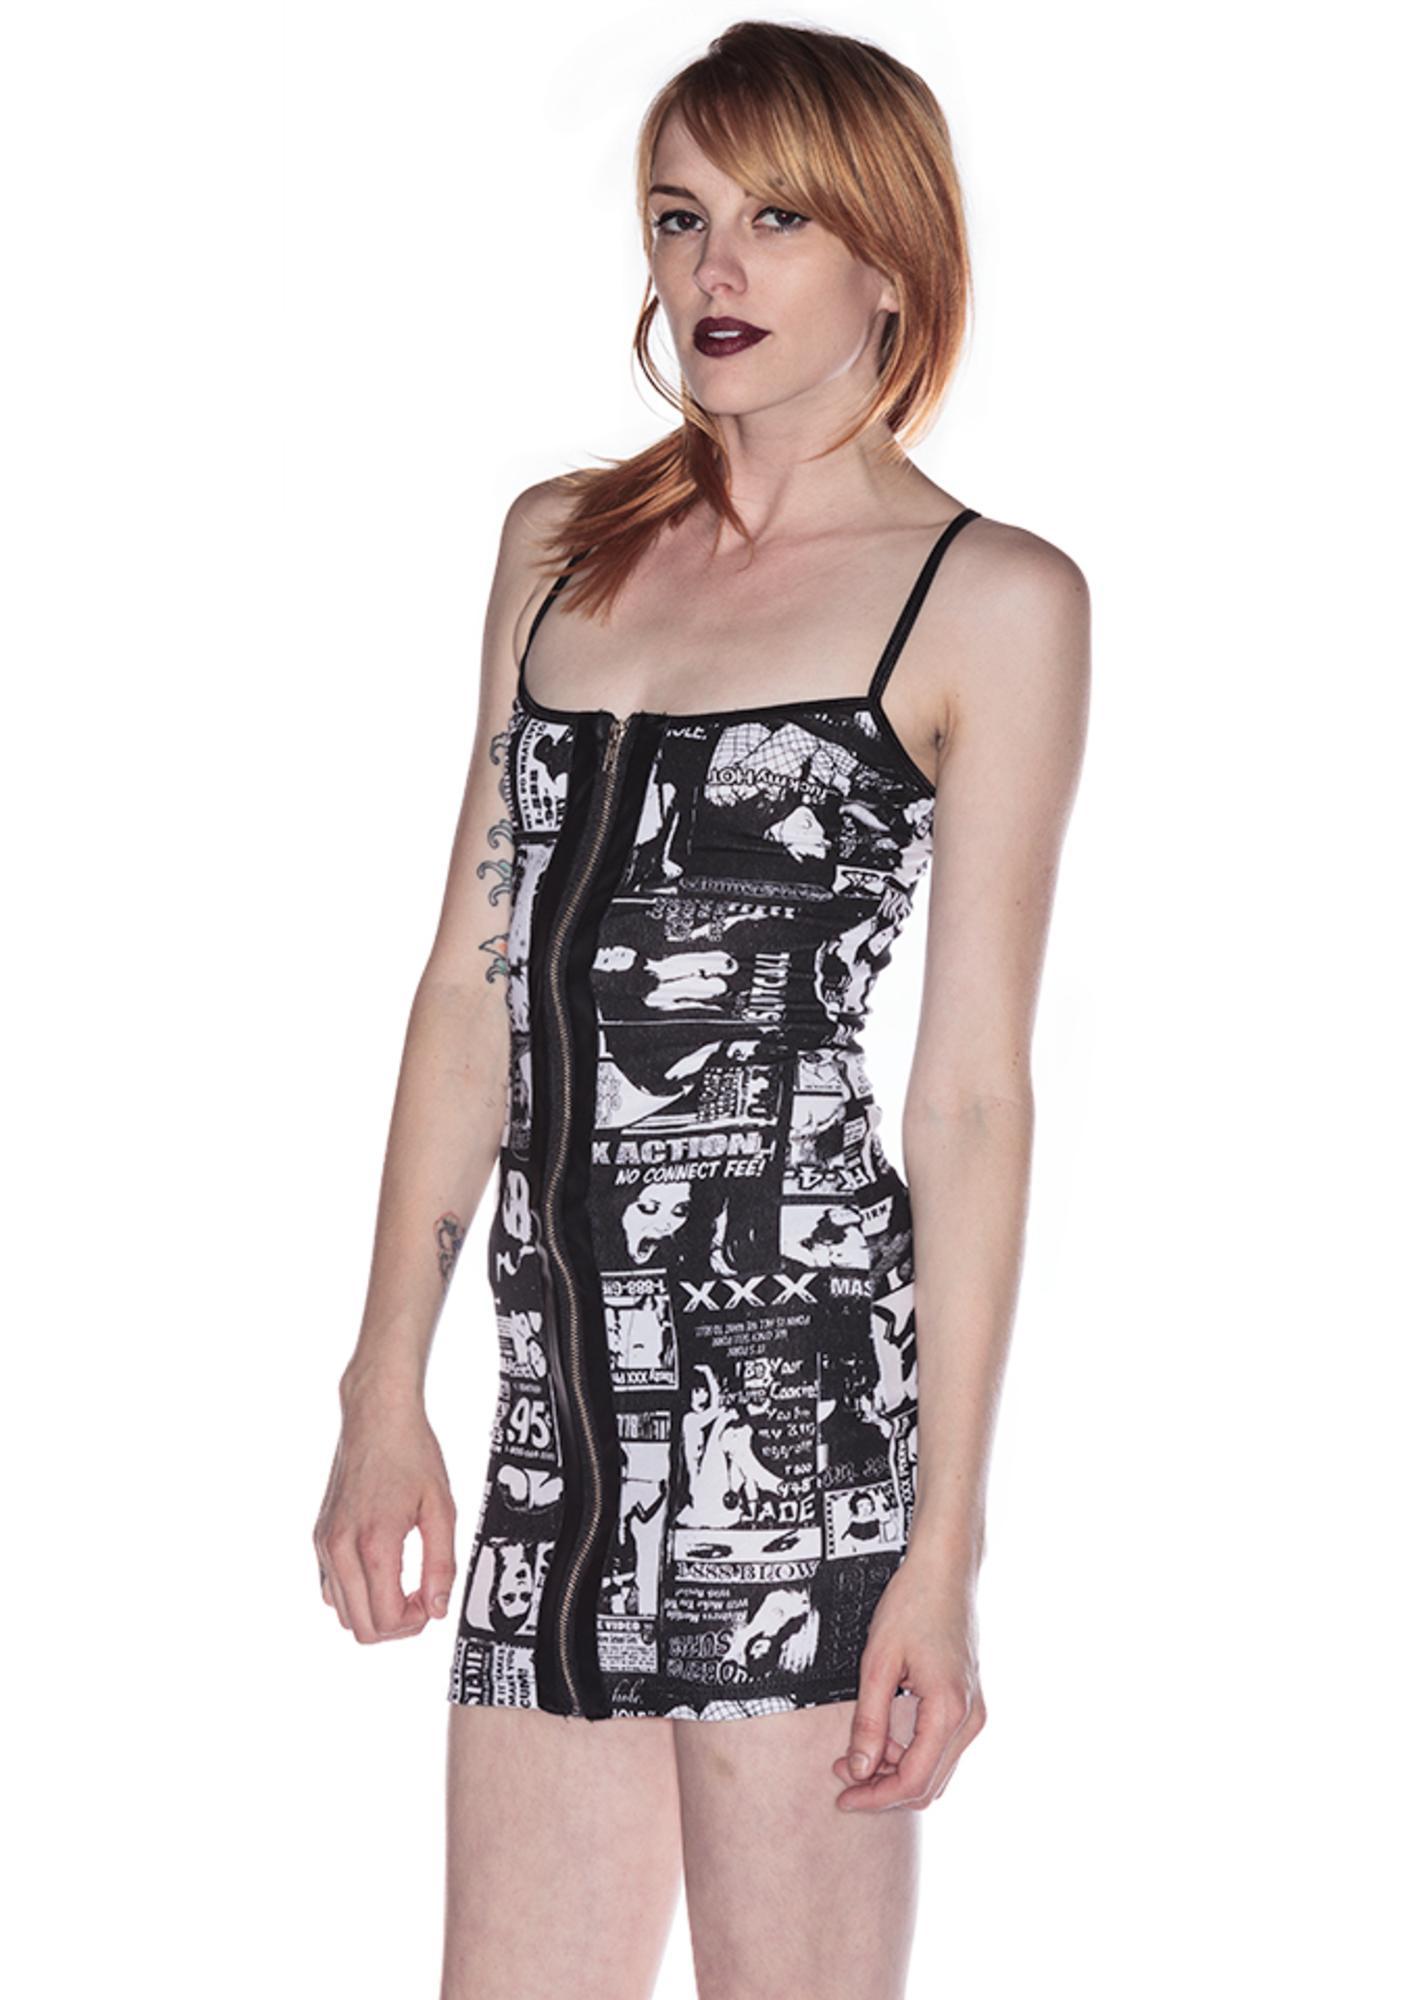 Lip Service Porno Print Dress